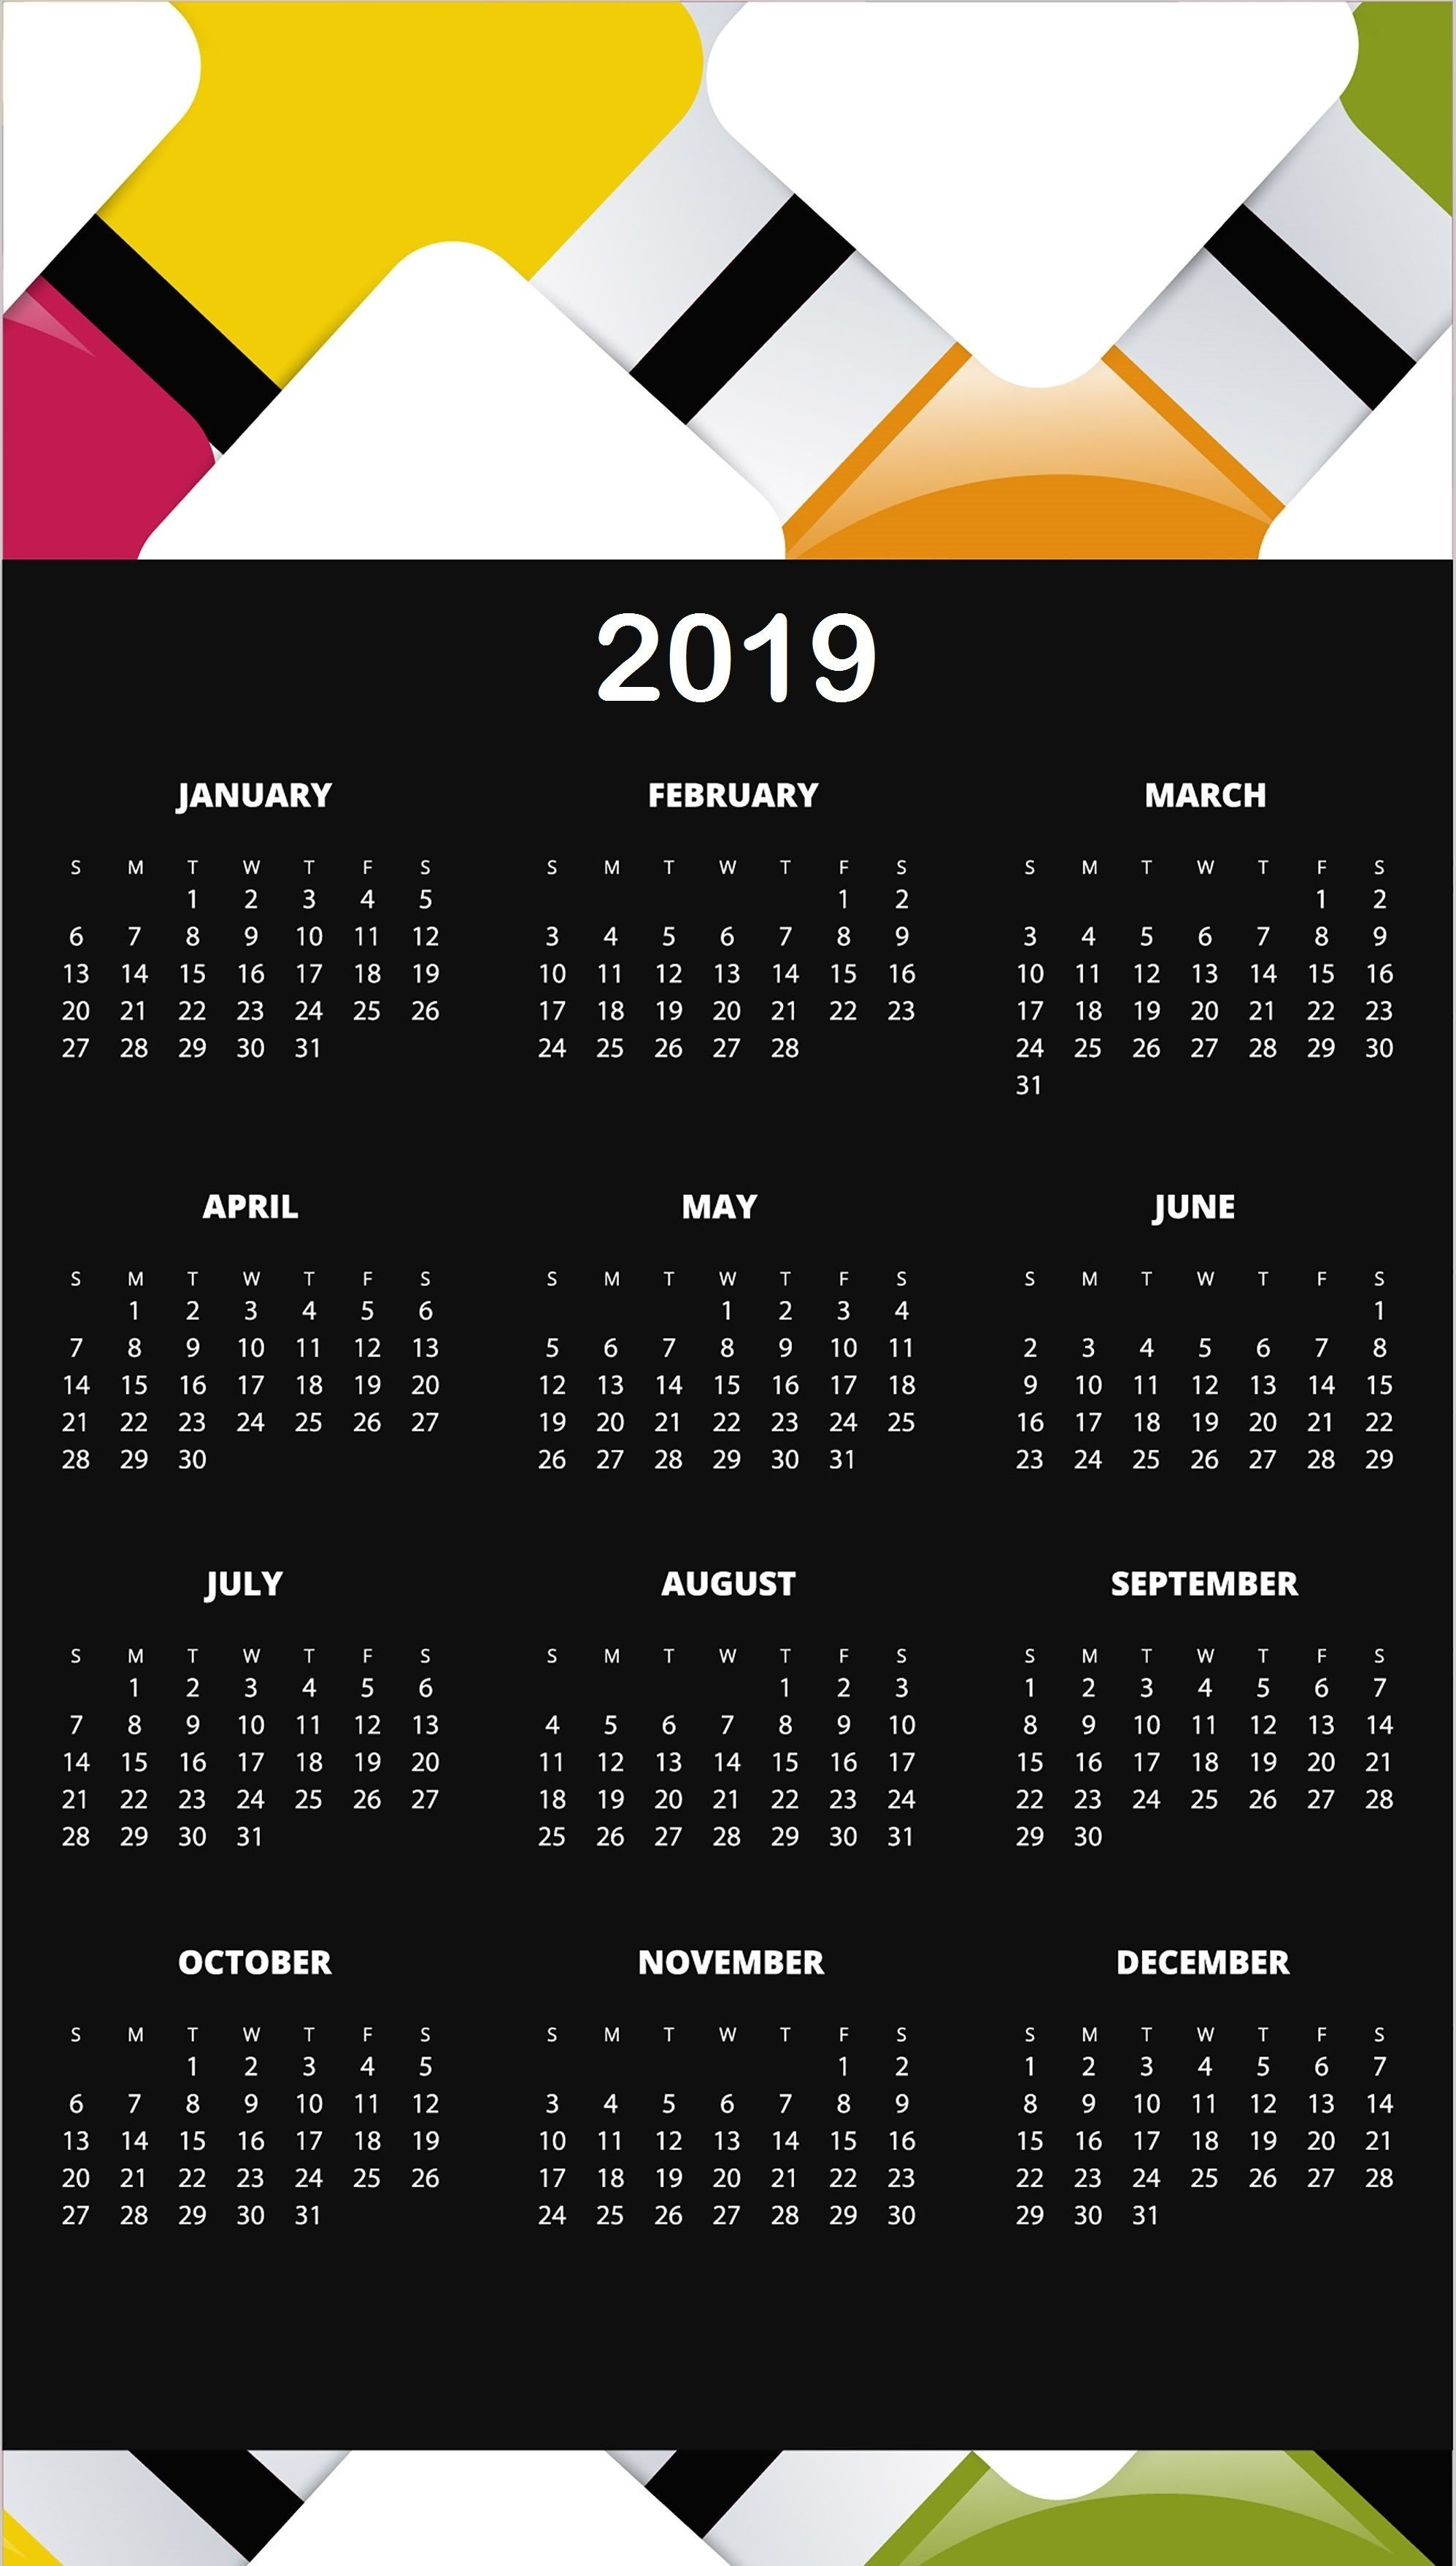 Printable Calendar April 2019 National Food Day | Calendar-Calander Of Monthly Food Days